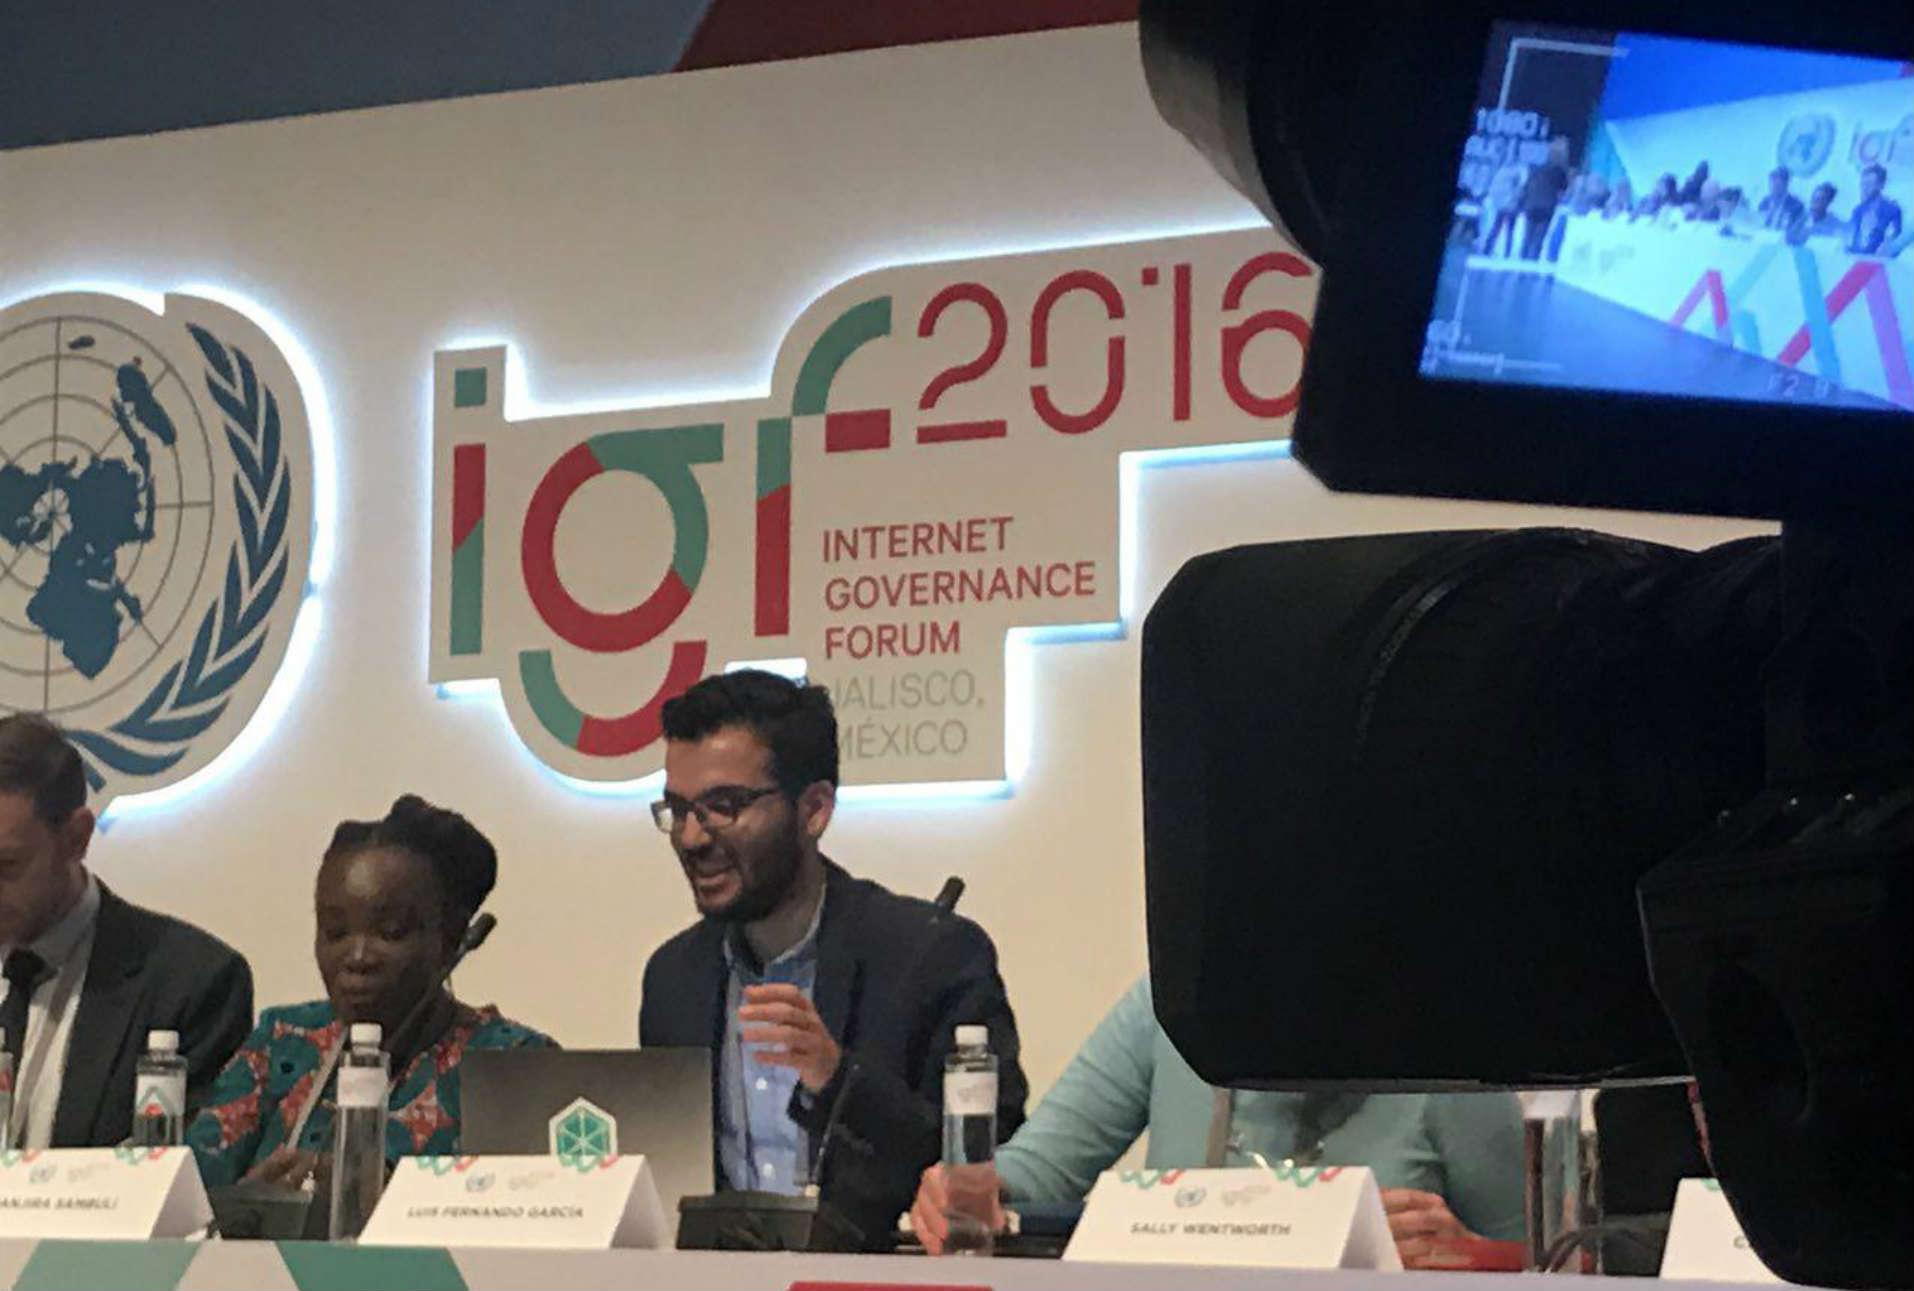 La vigilancia fuera de control compromete el diálogo sobre gobernanza de Internet